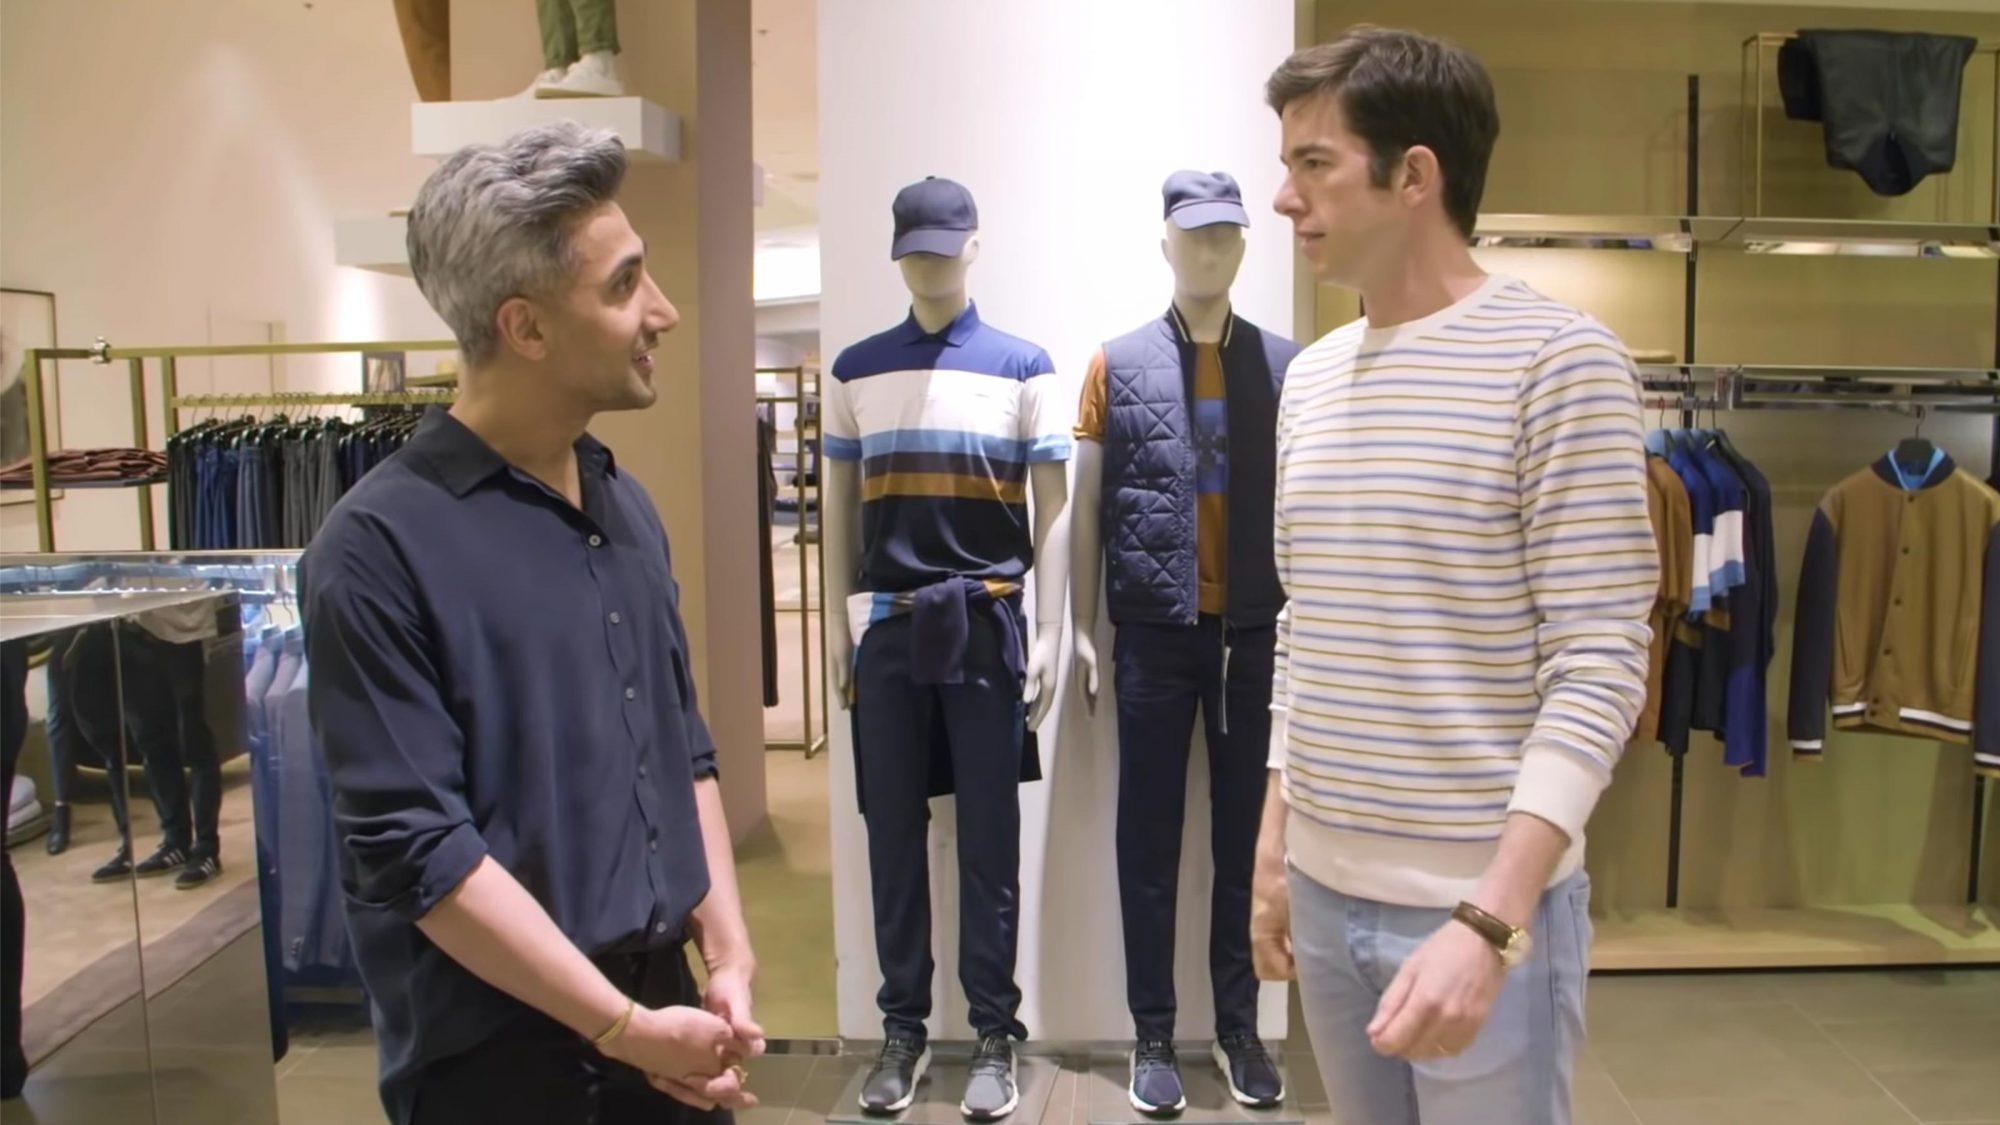 Tan France Gives John Mulaney a Hypebeast Makeover | Dressing Funny | Netflix Is A Joke (screen grab) https://www.youtube.com/watch?v=N8Fin1aw9oM CR: Netflix